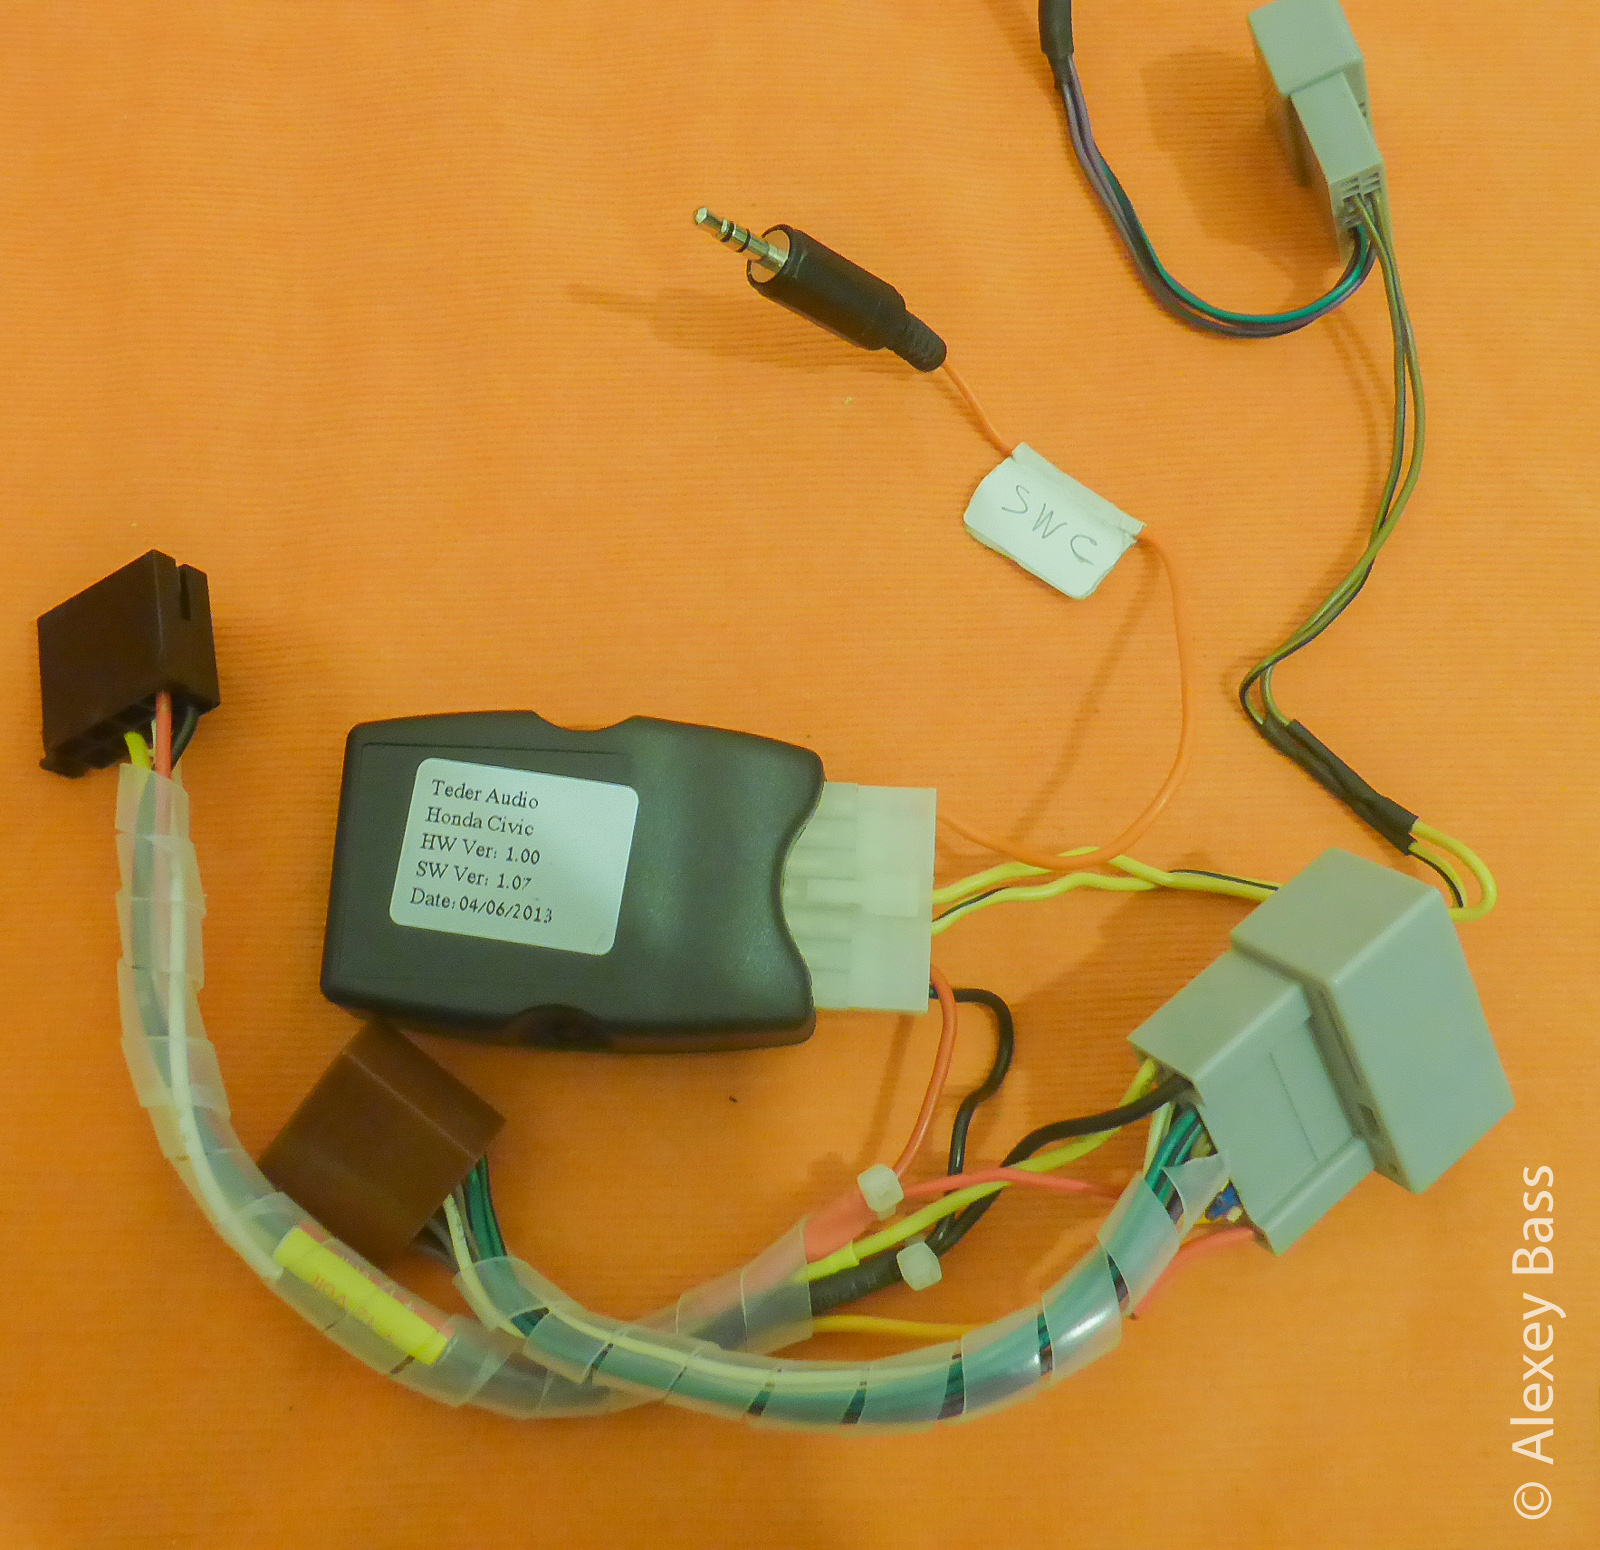 honda civic steering wiring [ 1600 x 1550 Pixel ]